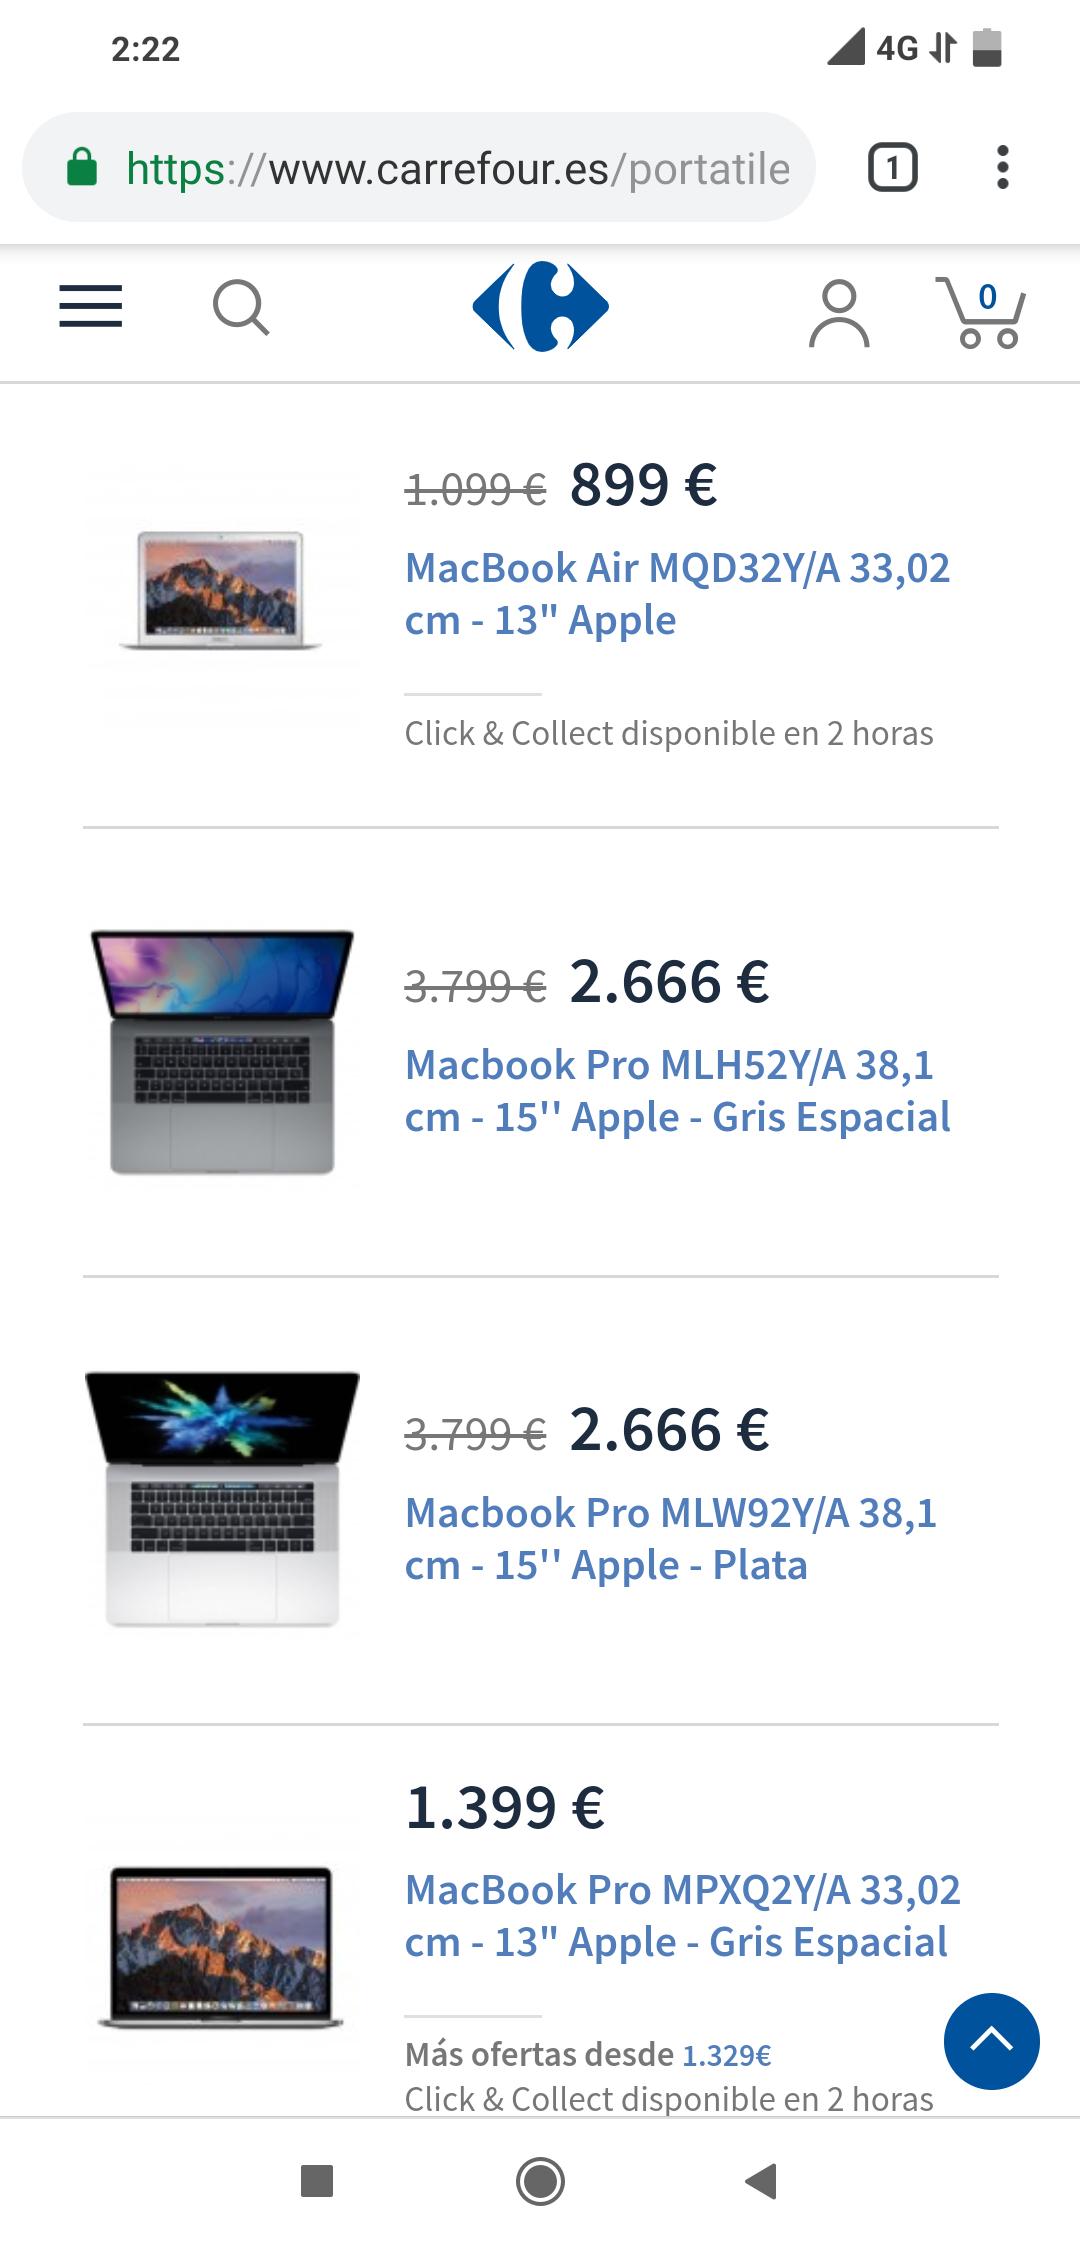 MacBook pro 15 pulgadas, 1tb ssd, 16 ram, i7 4 nucleos